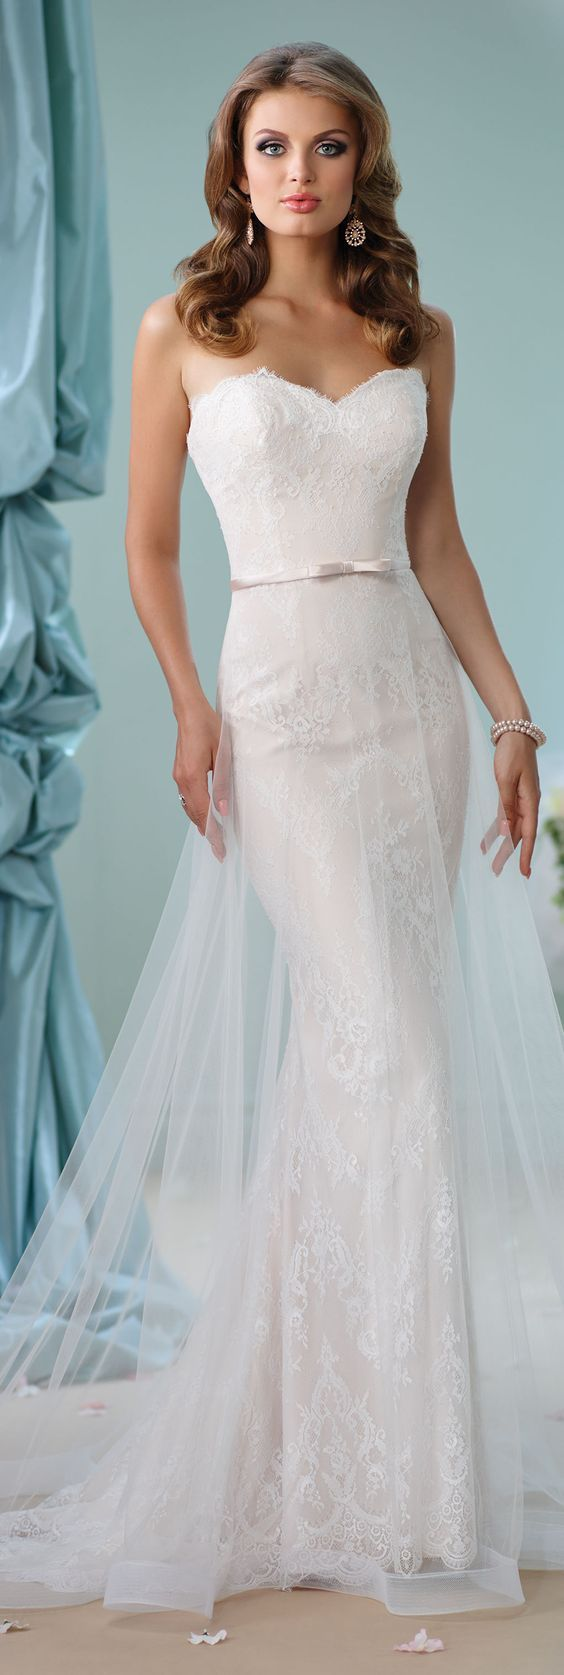 Wedding - 116134